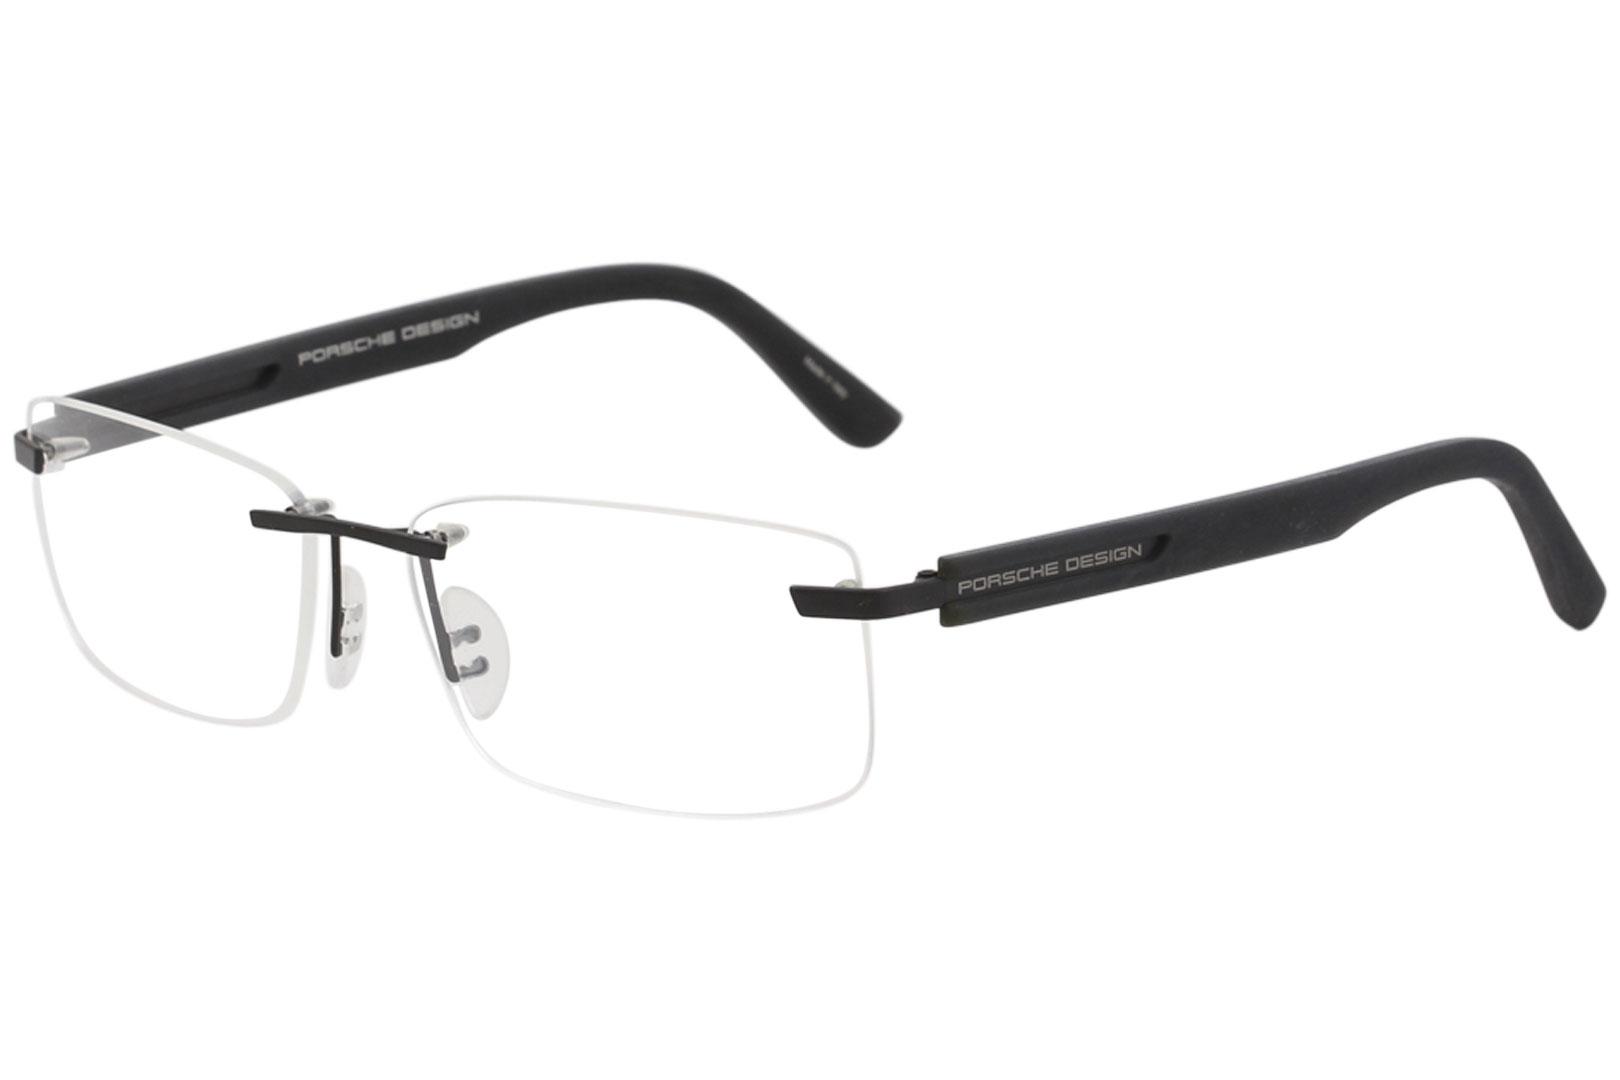 24113d0da05 Porsche Design Men s Eyeglasses P8232 P 8232 A Black Rimless Optical ...